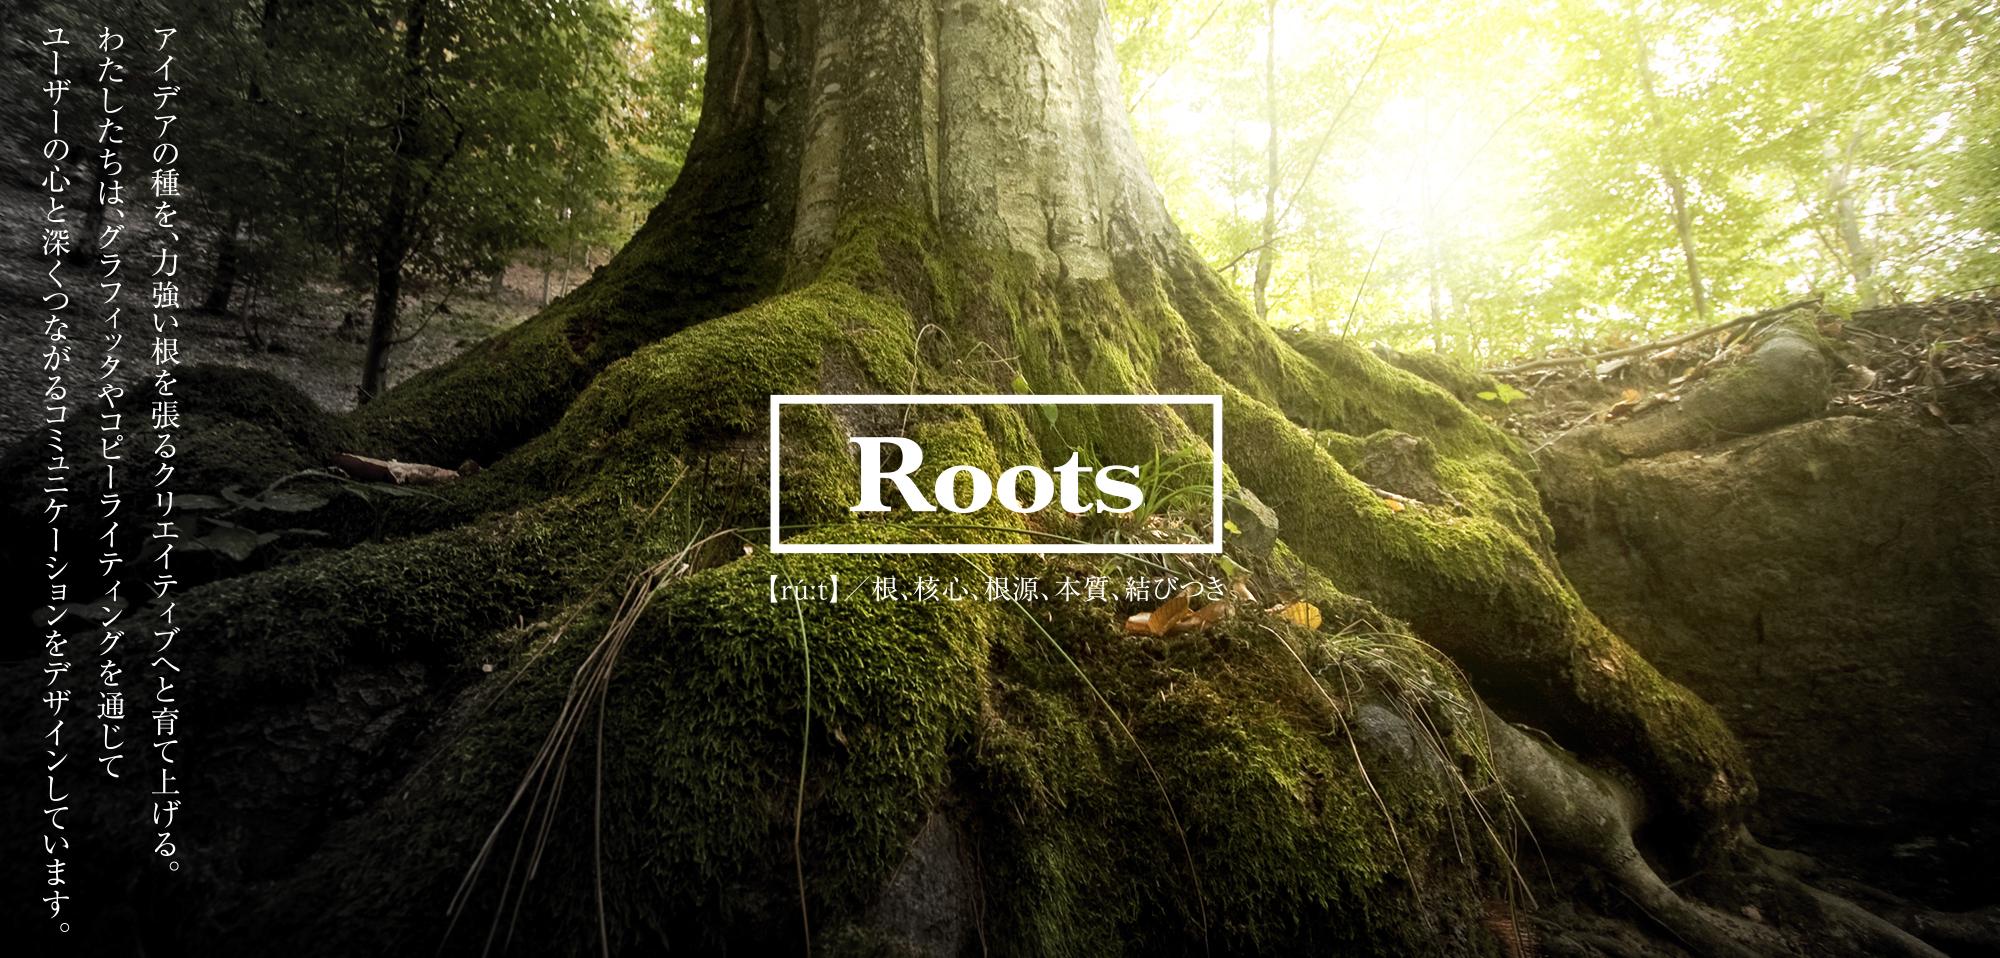 rootsdesign